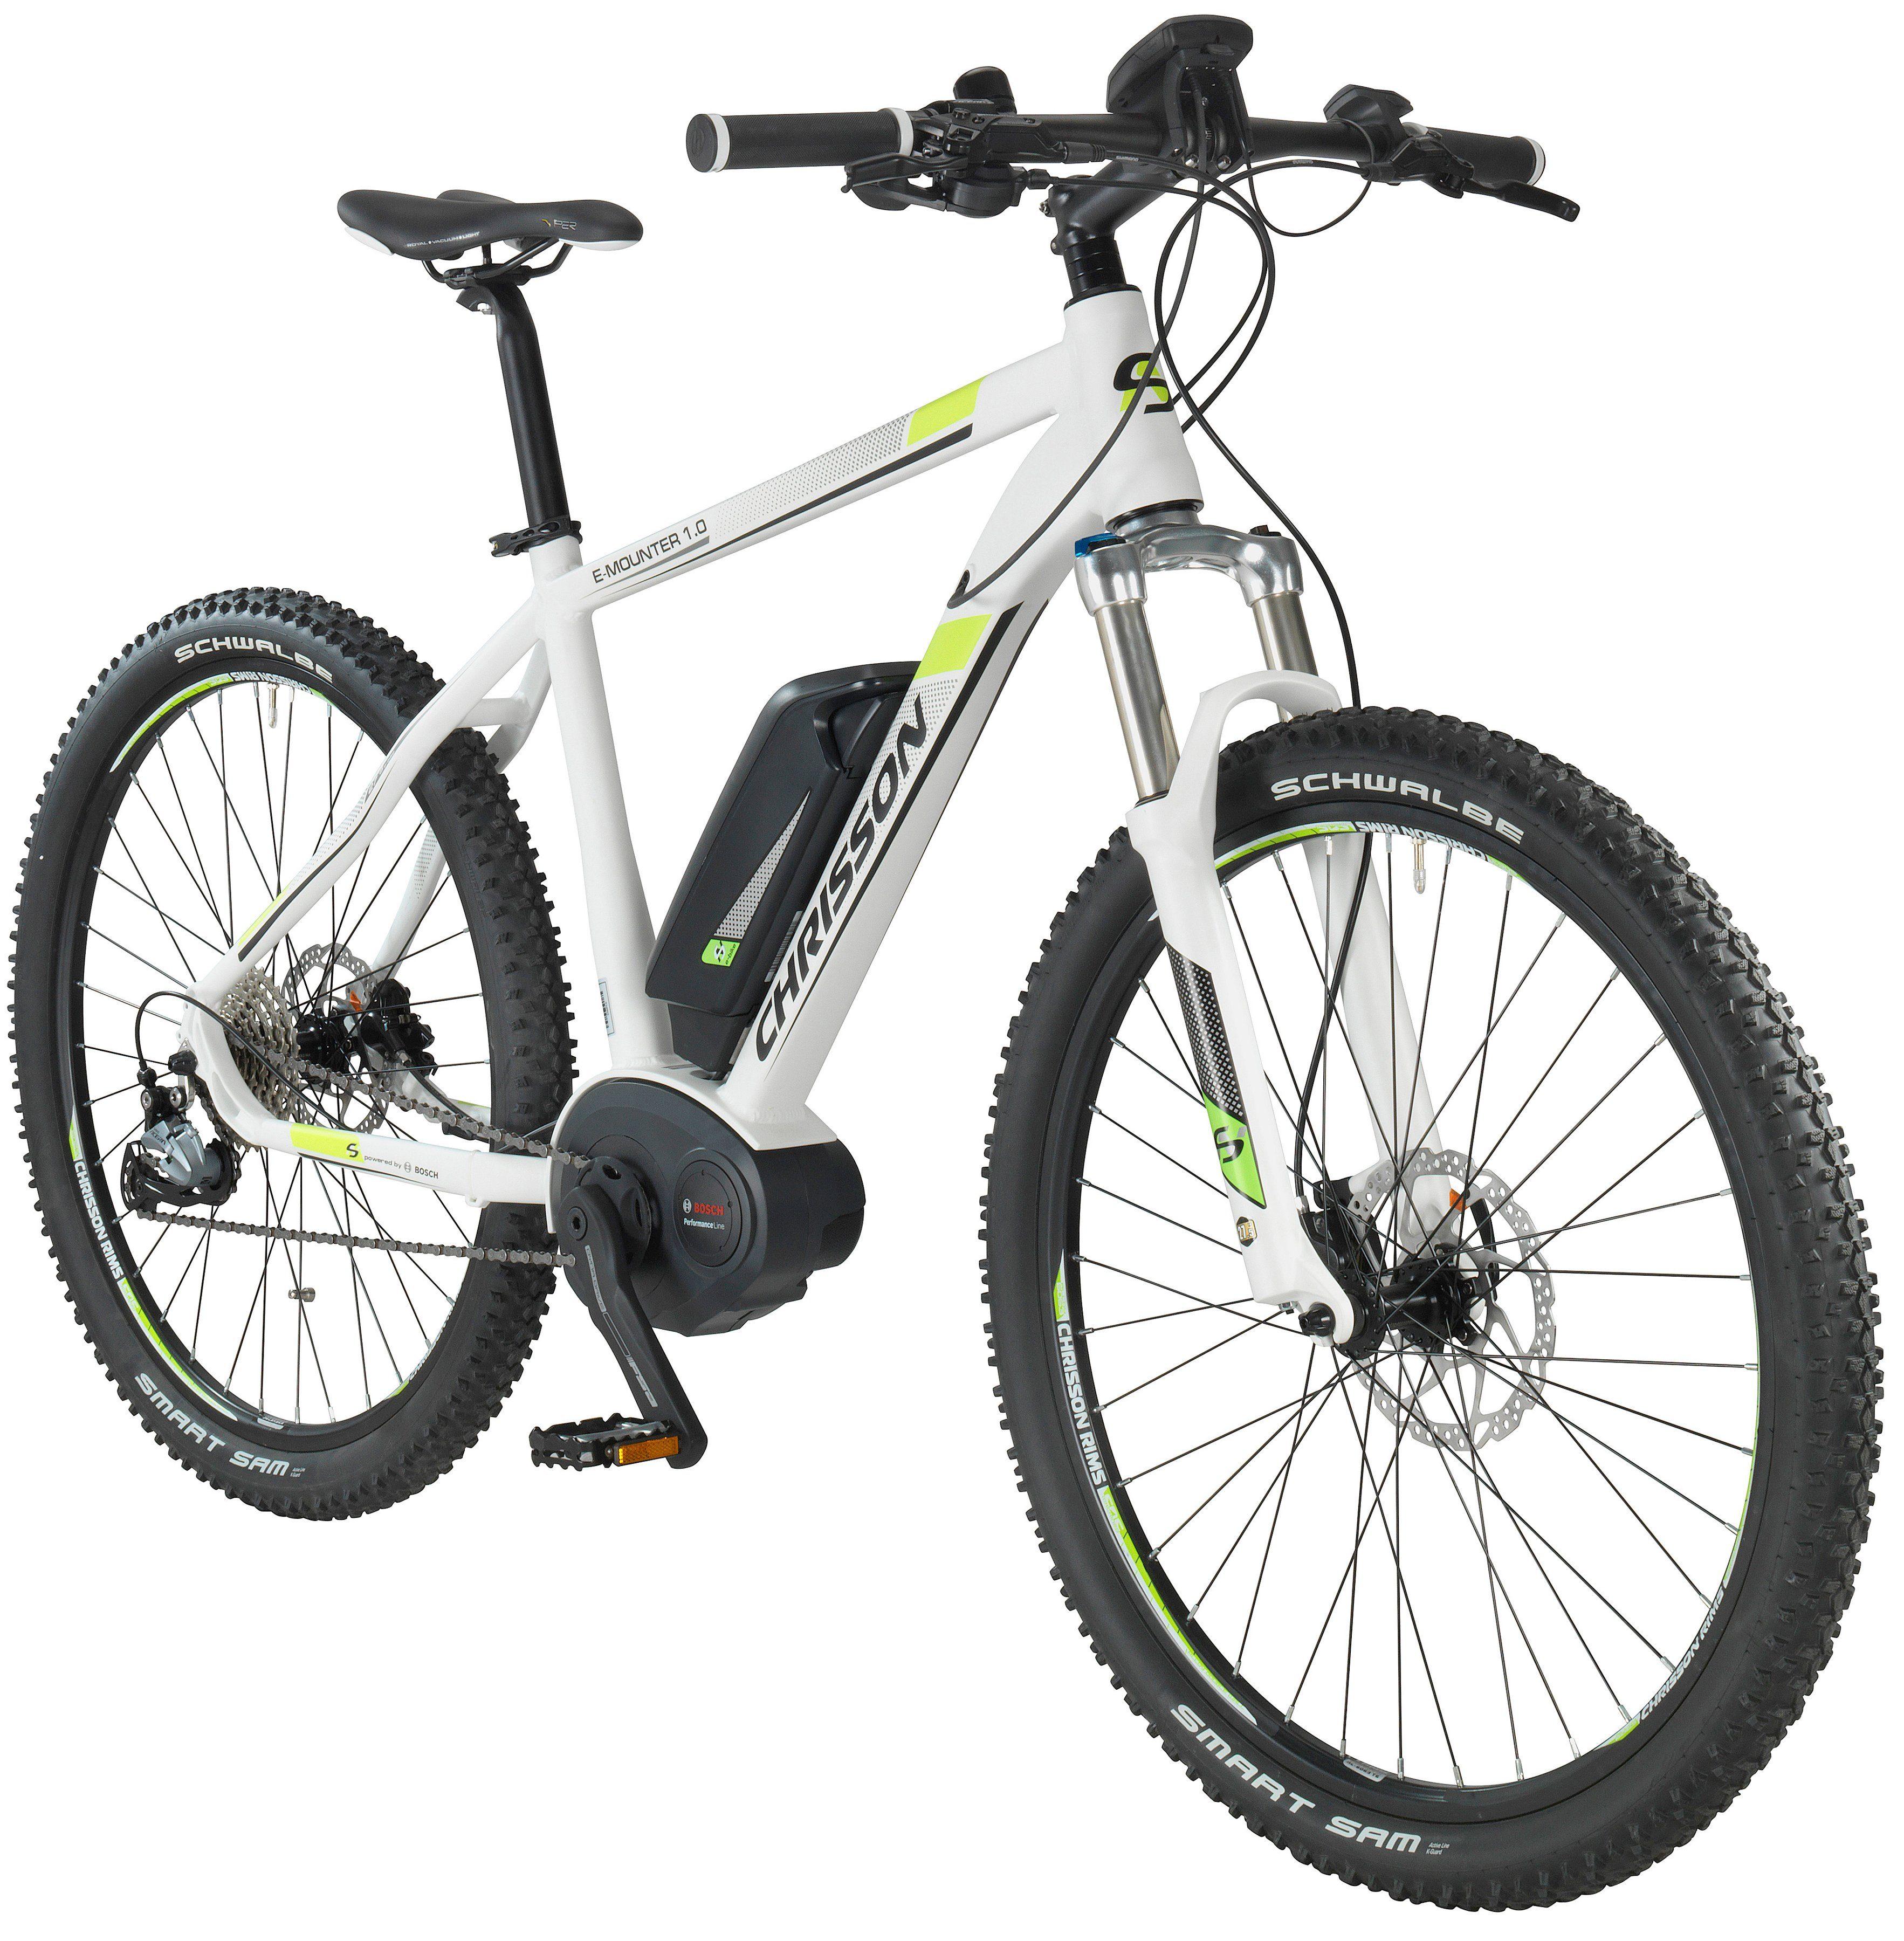 CHRISSON E-Bike Mountainbike »E-Mounter«, 27,5 Zoll, 44cm Rahmenhöhe, 9 Gang, BOSCH Mittelmotor